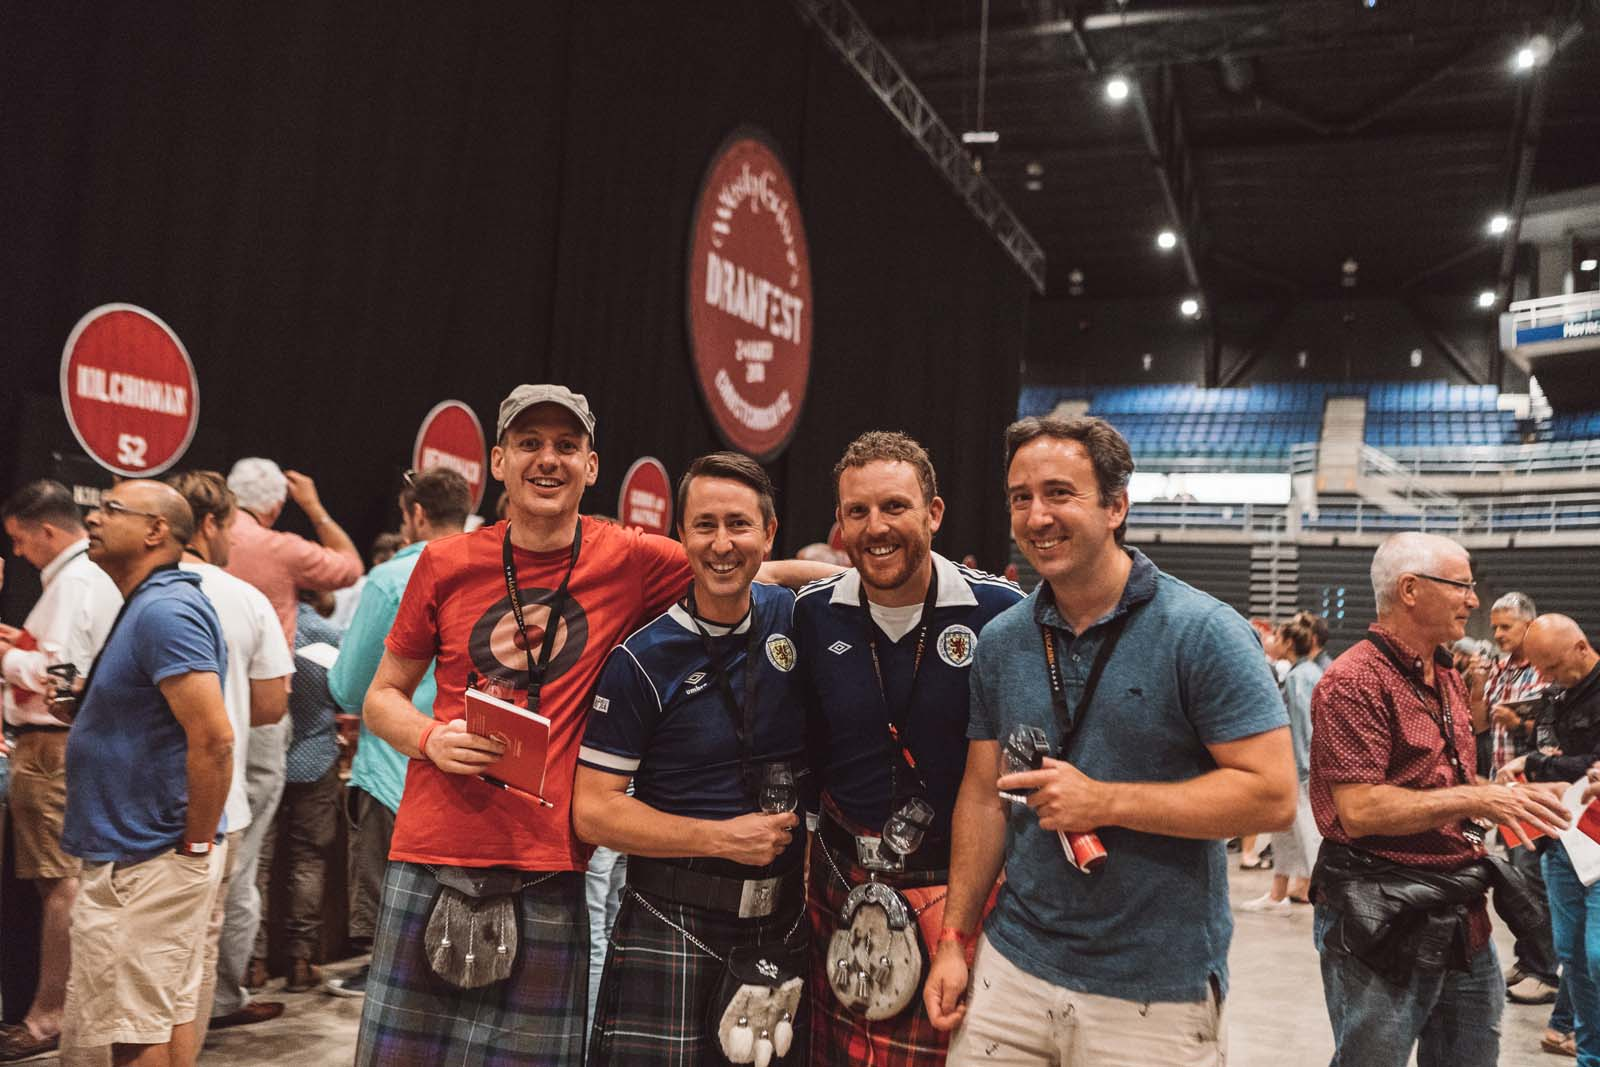 Dramfest 2018 for Whisky Galore-343.jpg